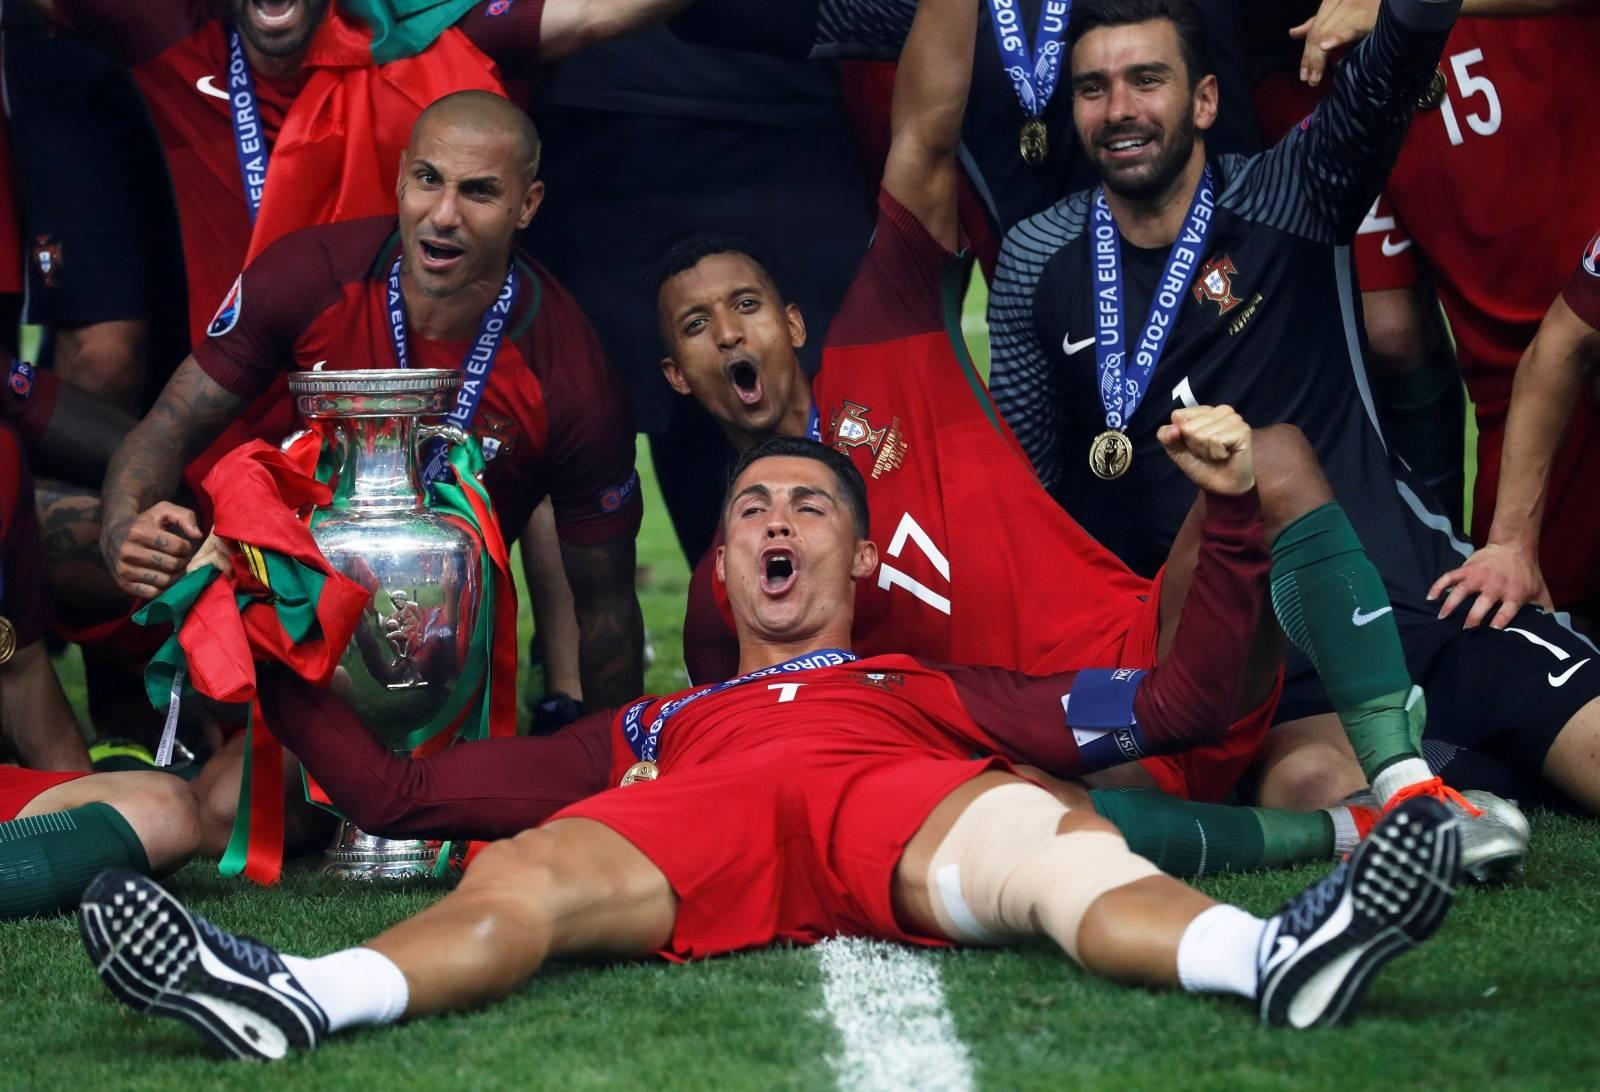 FILE PHOTO: Portugal v France - EURO 2016 - Final